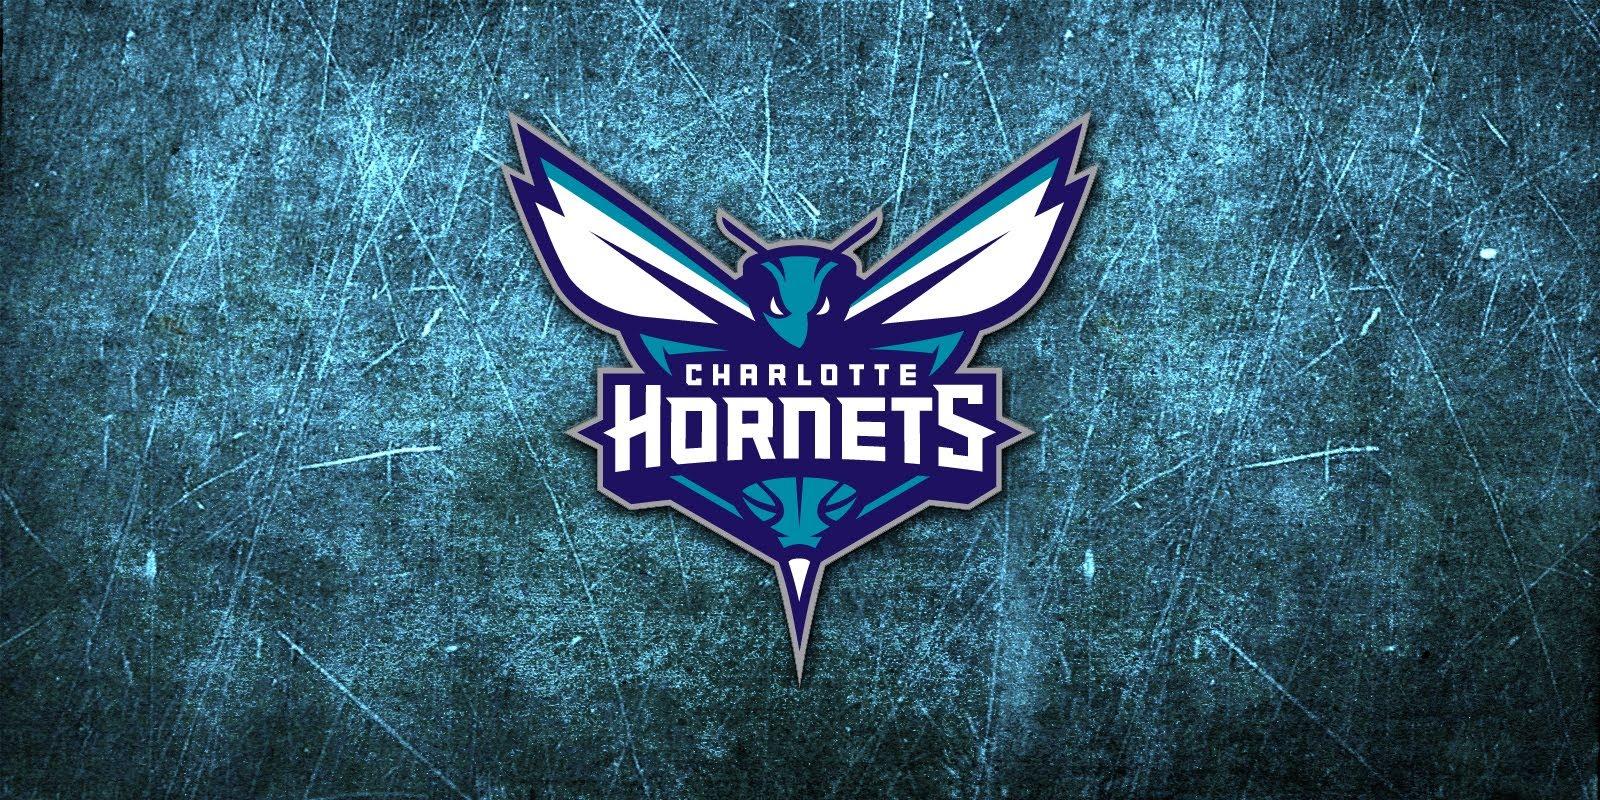 Download Charlotte Hornets Wallpaper HD Wallpapers [1600x800] 47 1600x800